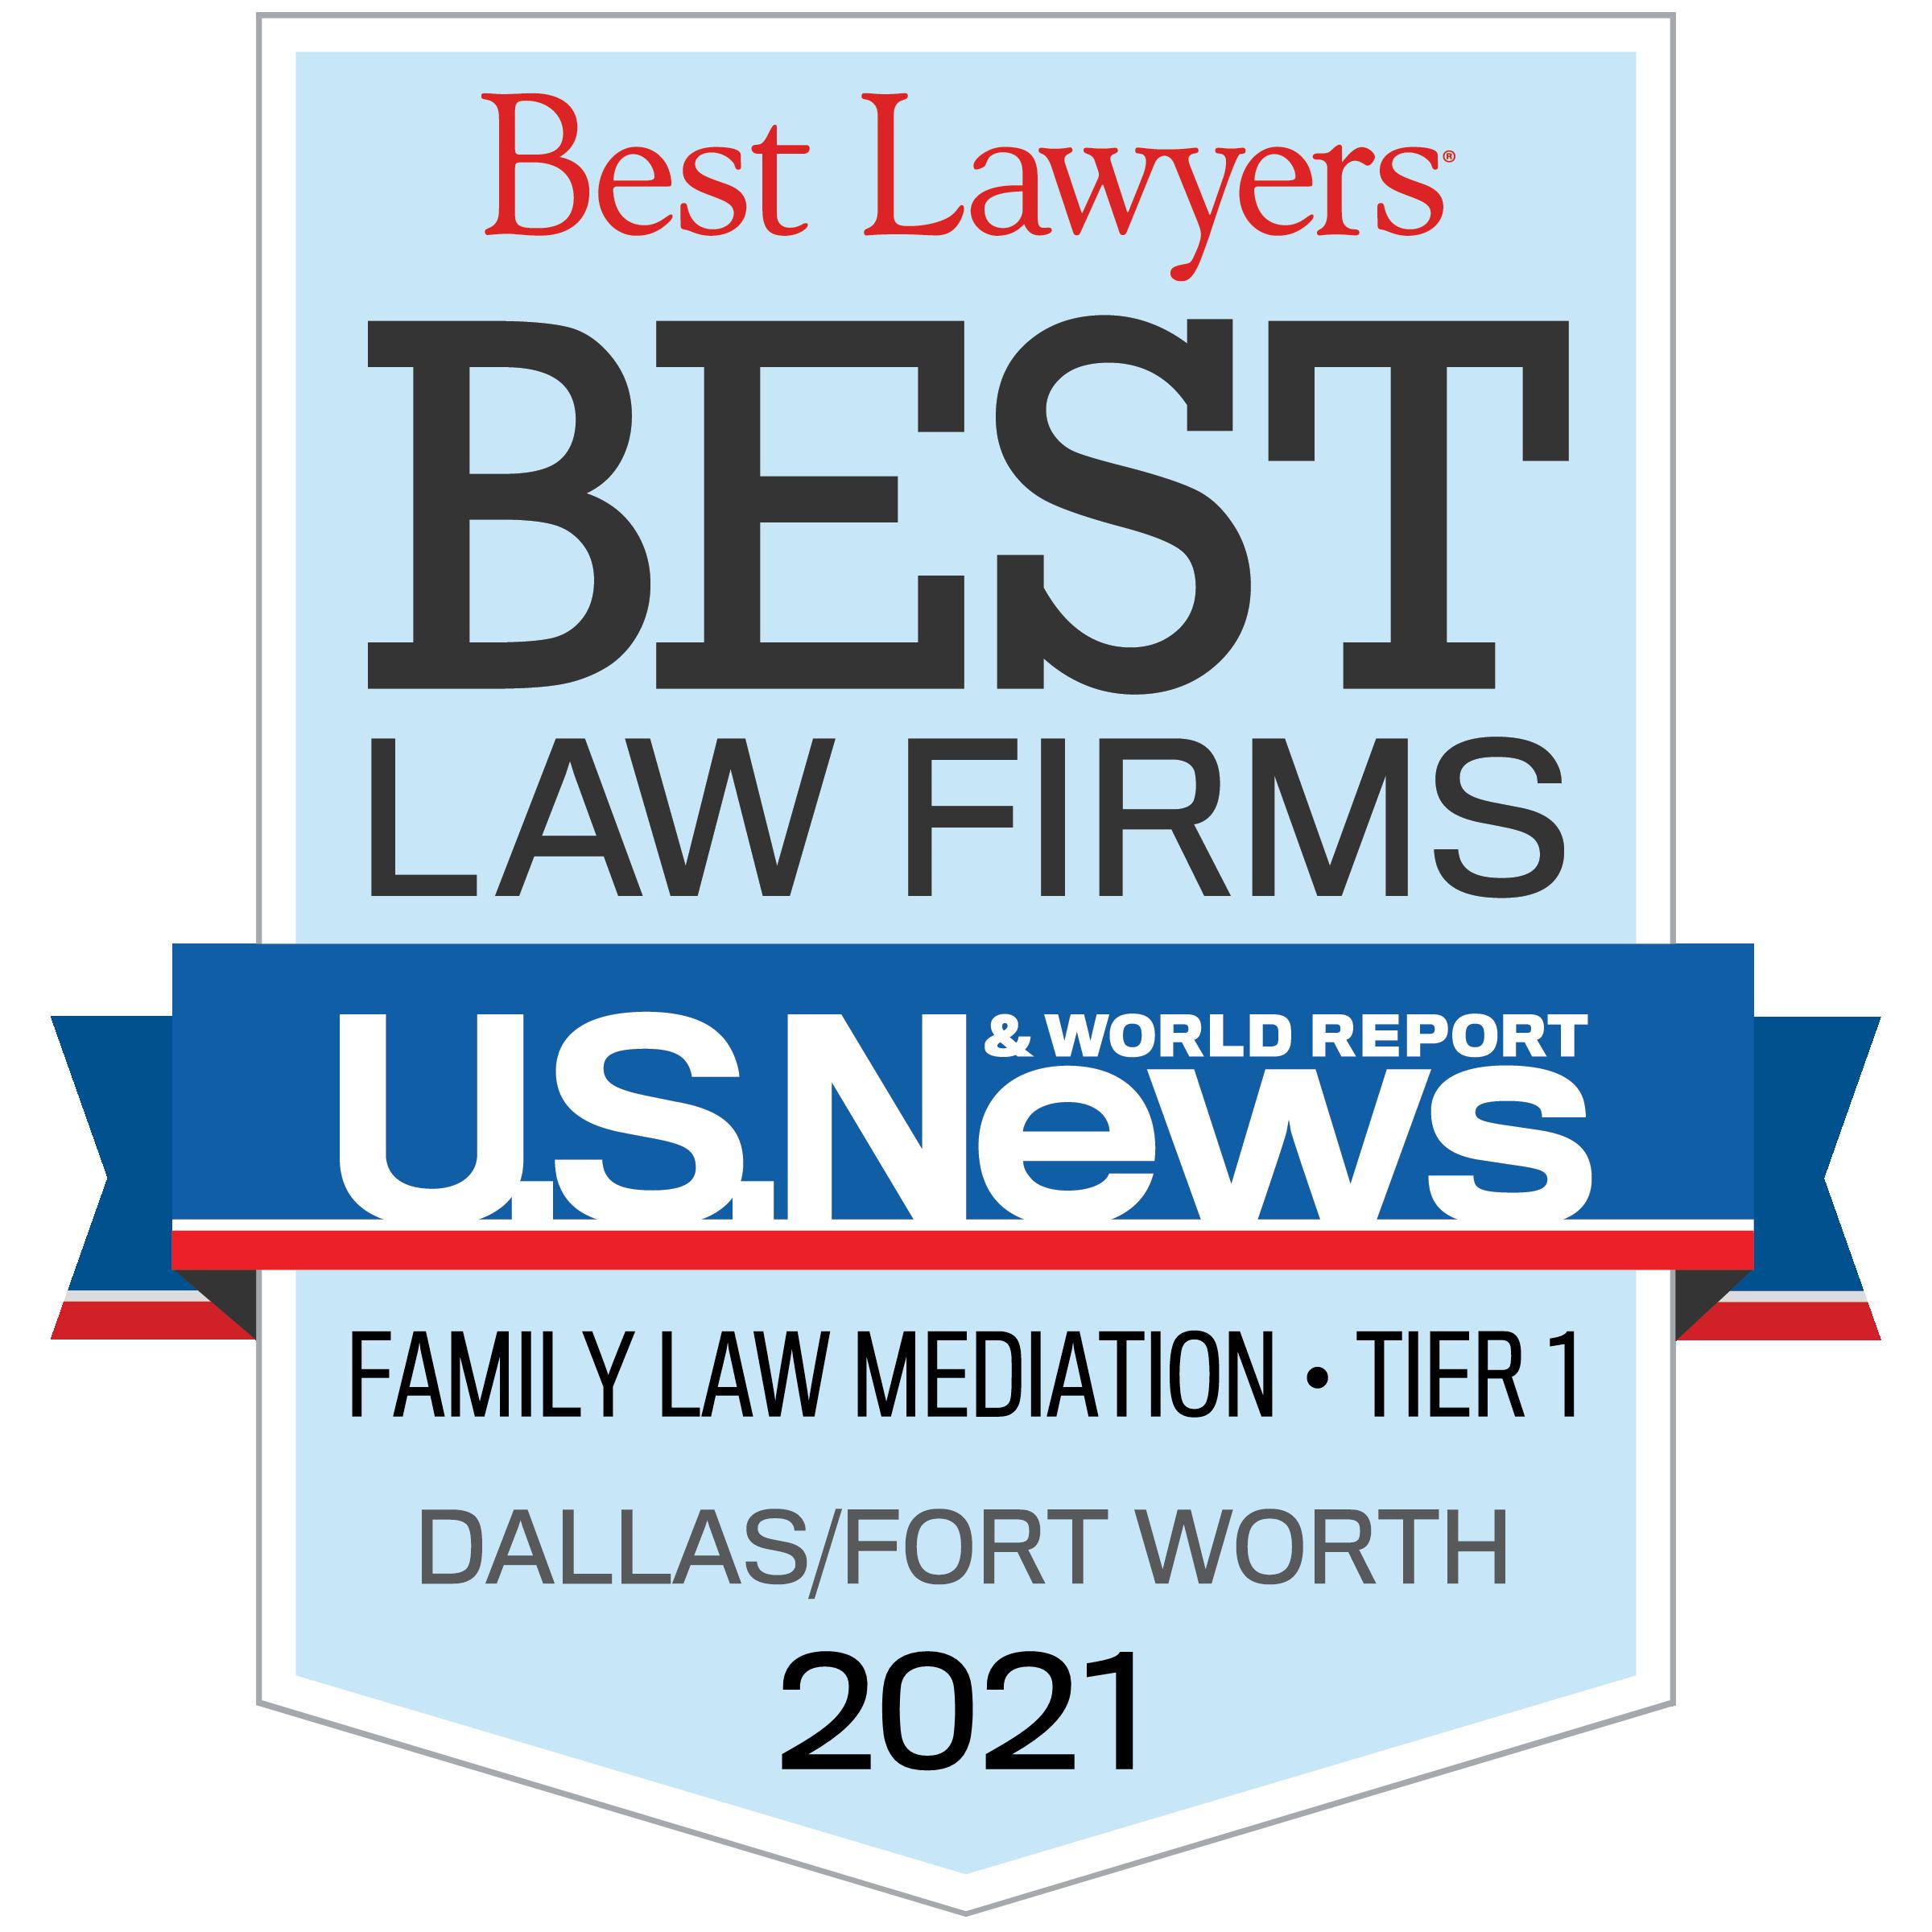 Best Lawyers Best Law Firm Family Law Mediation Dallas 2021